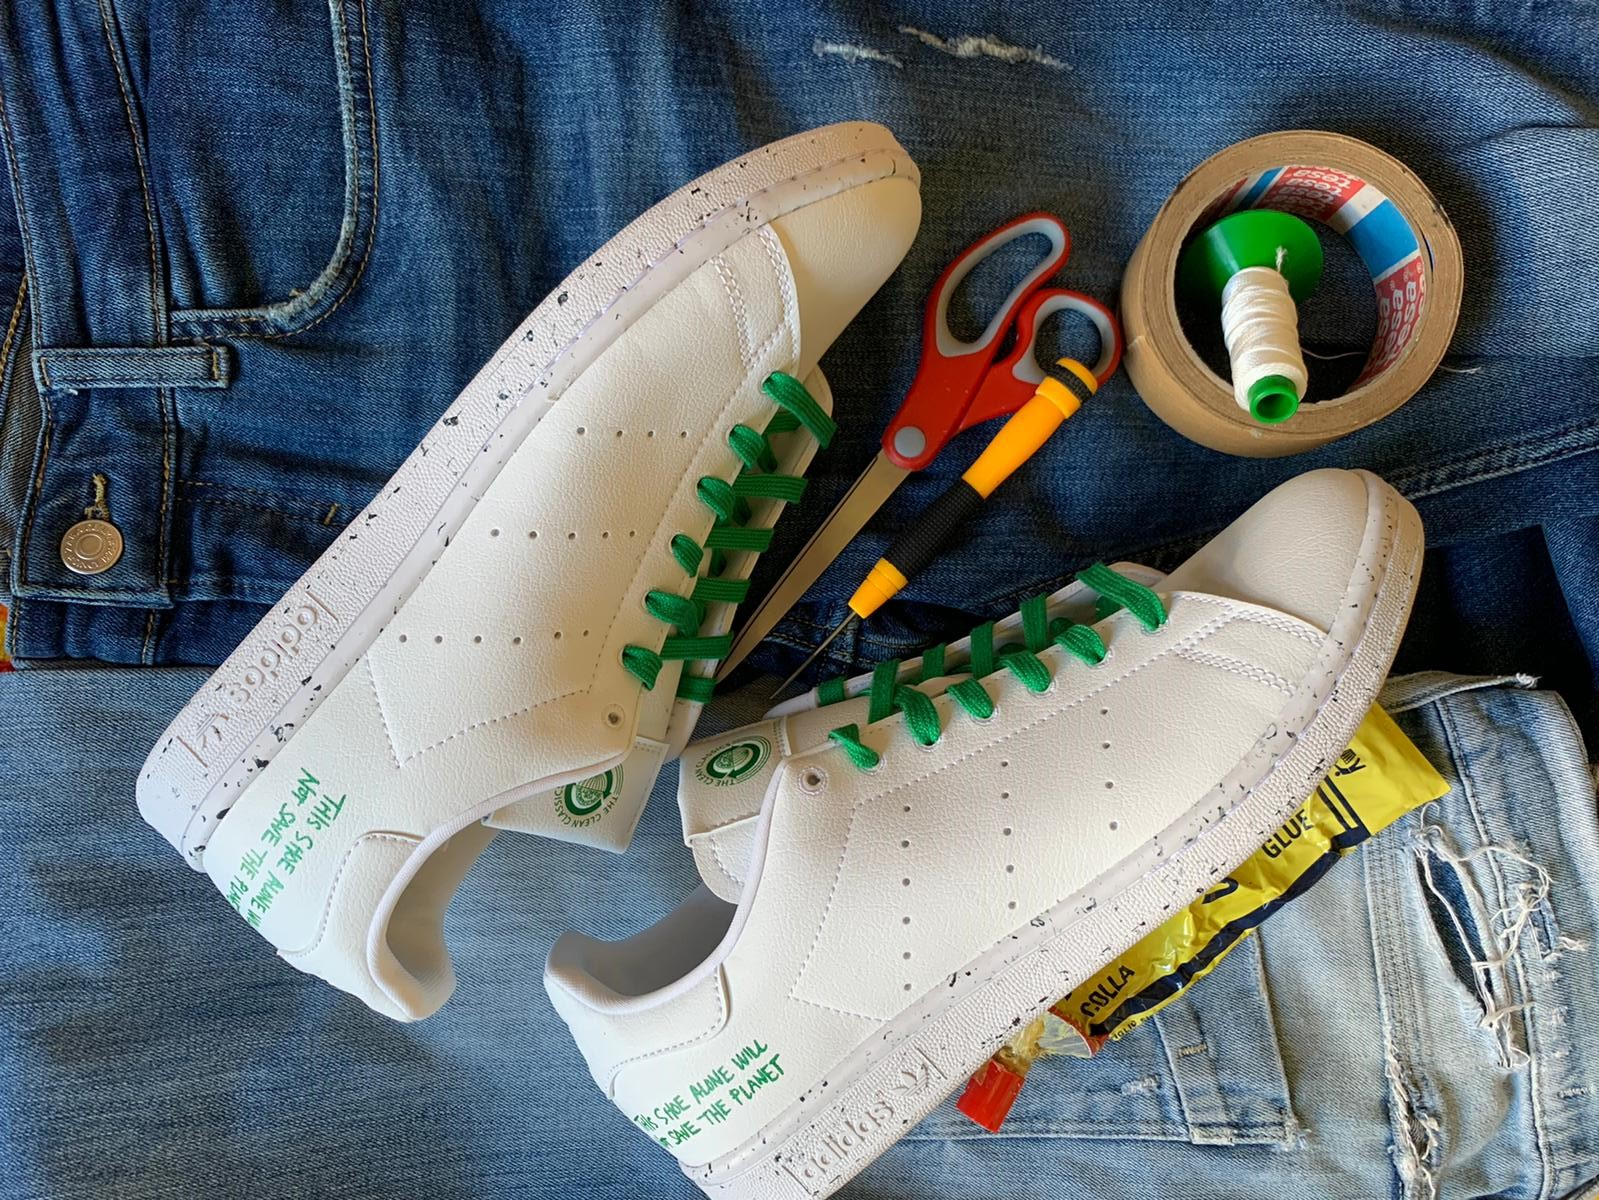 AW LAB e Adidas Originals lanciano il progetto AW LAB Style Academy